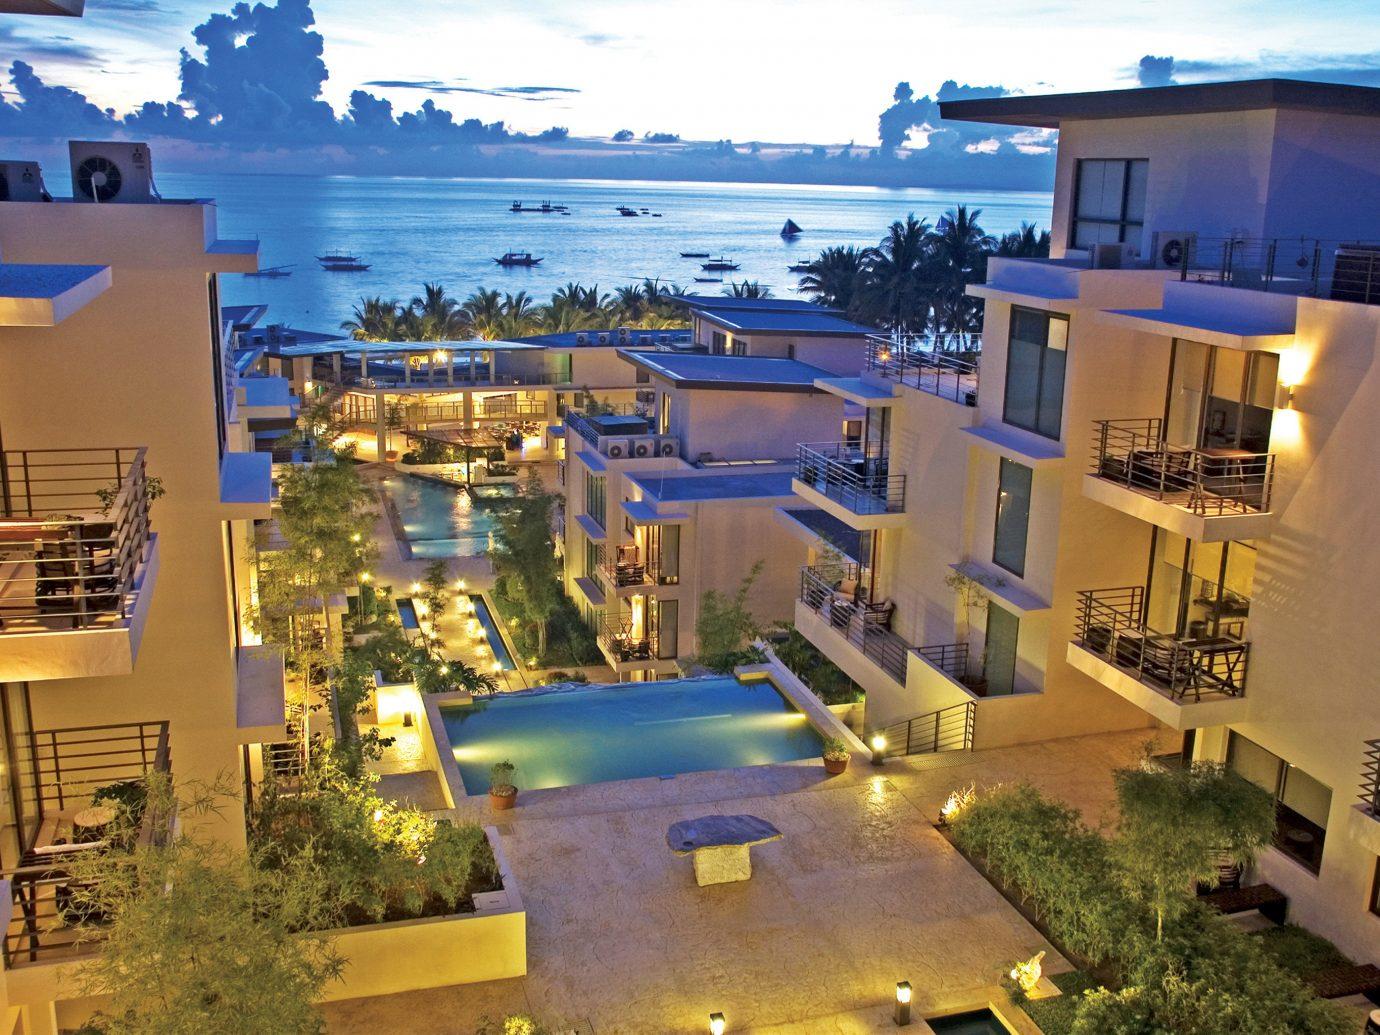 Architecture Buildings Design Exterior Hotels Resort Scenic views property condominium house estate vacation home residential area Villa mansion apartment